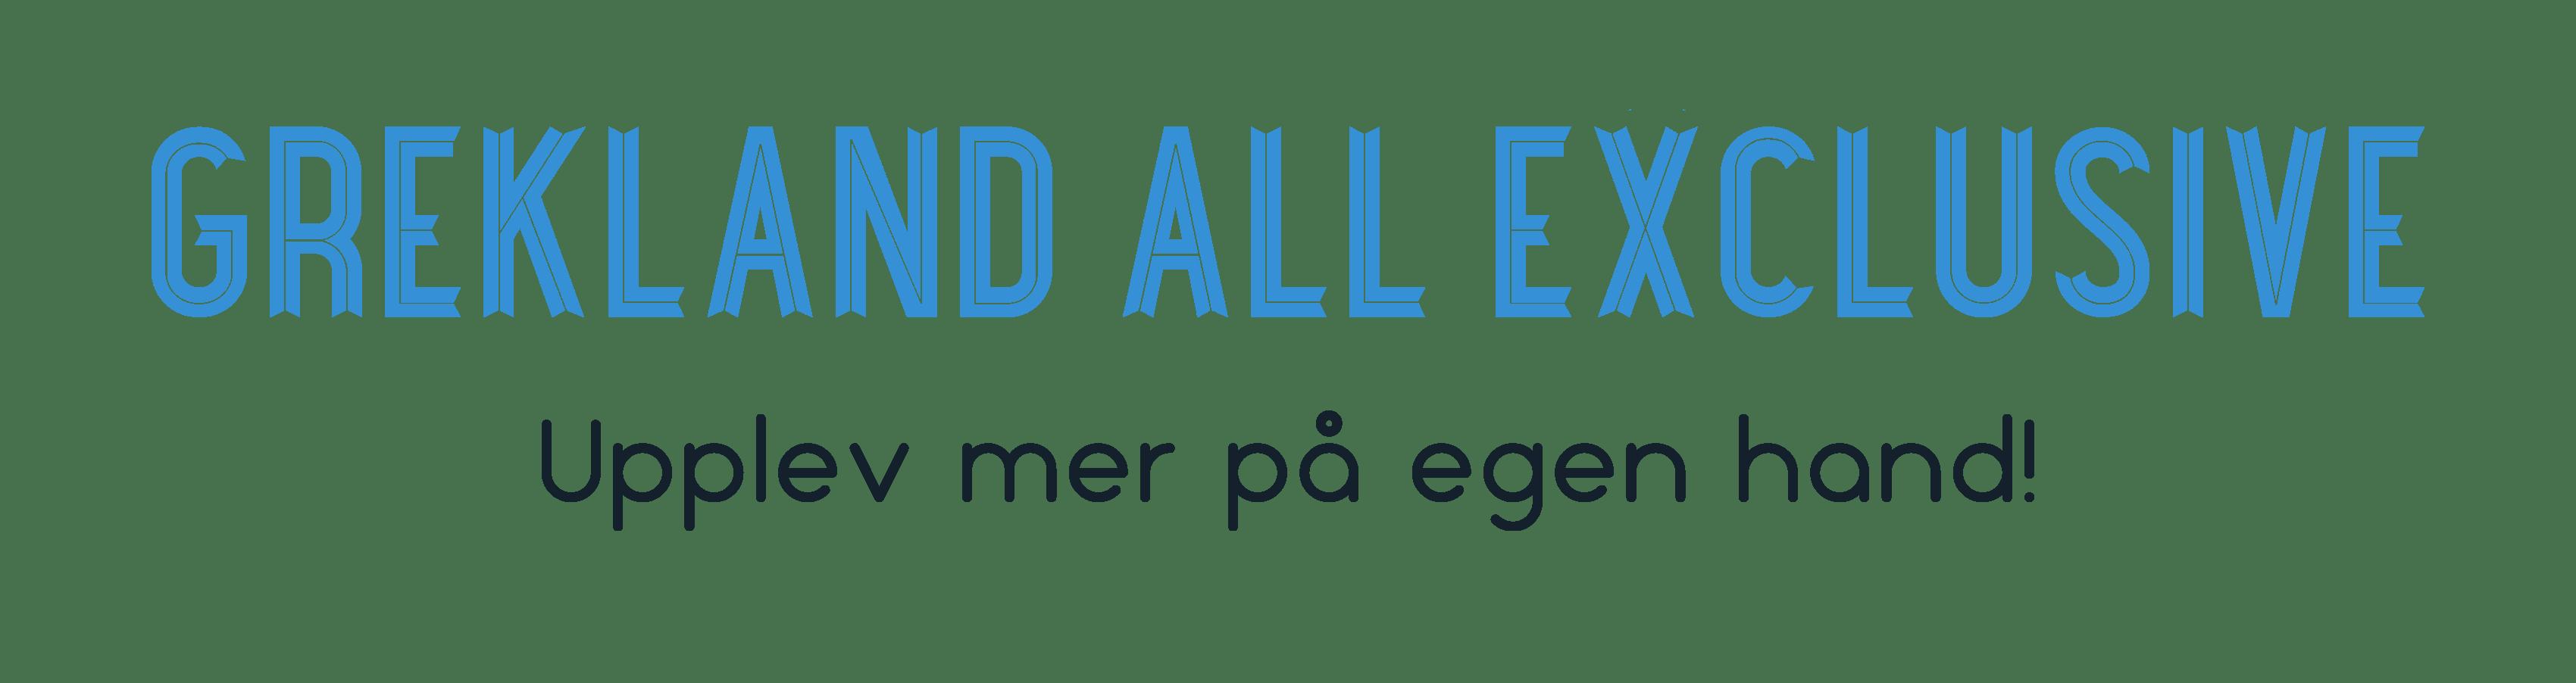 Grekland All Exclusive